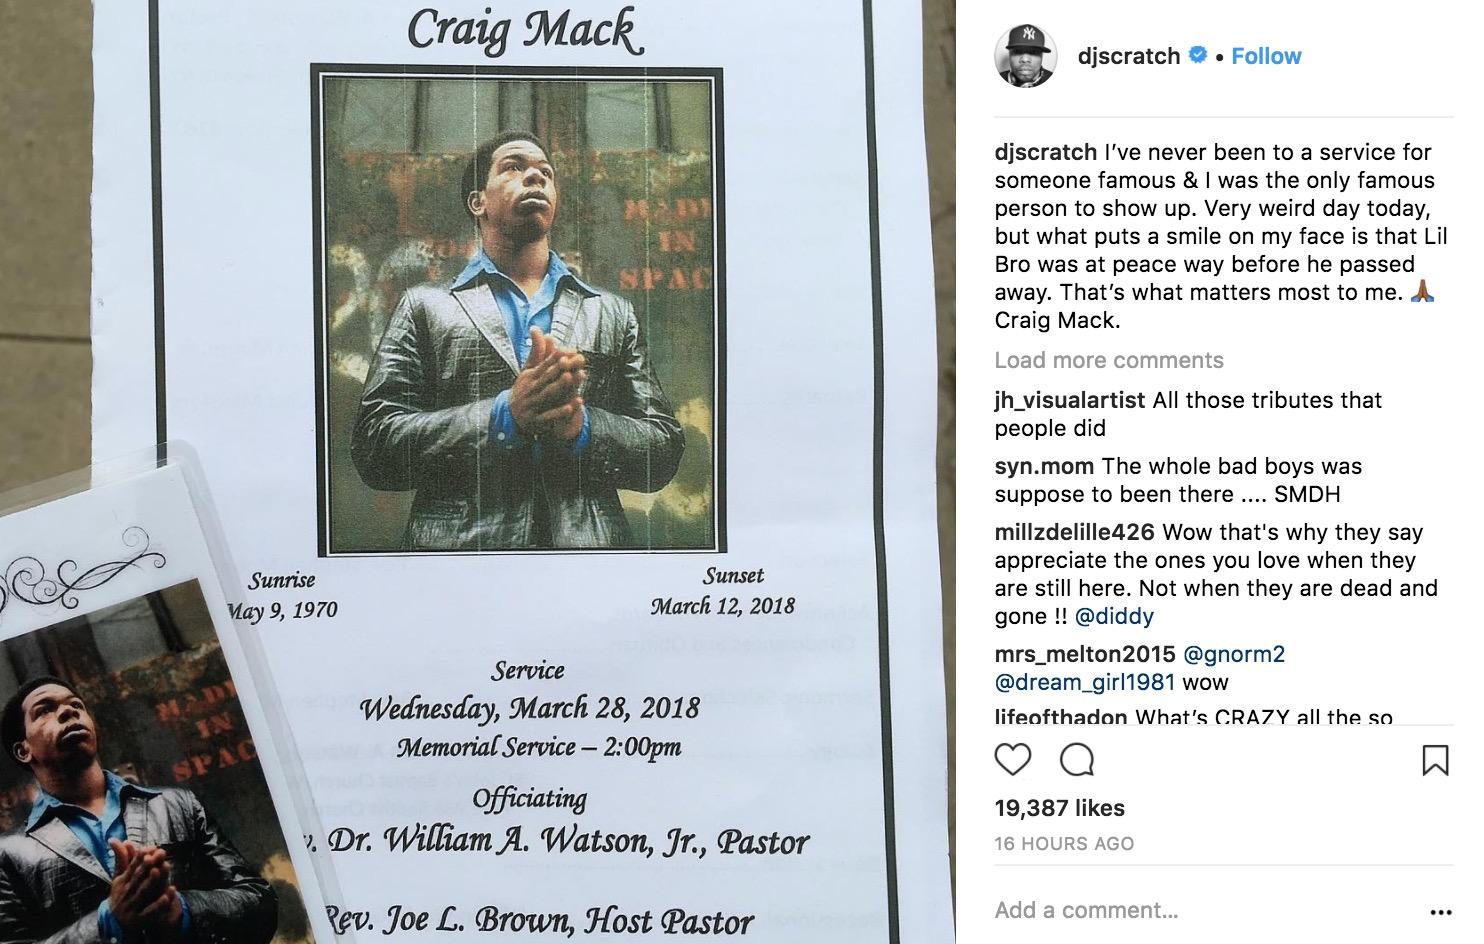 Craig Mack DJ Scratch IG 1